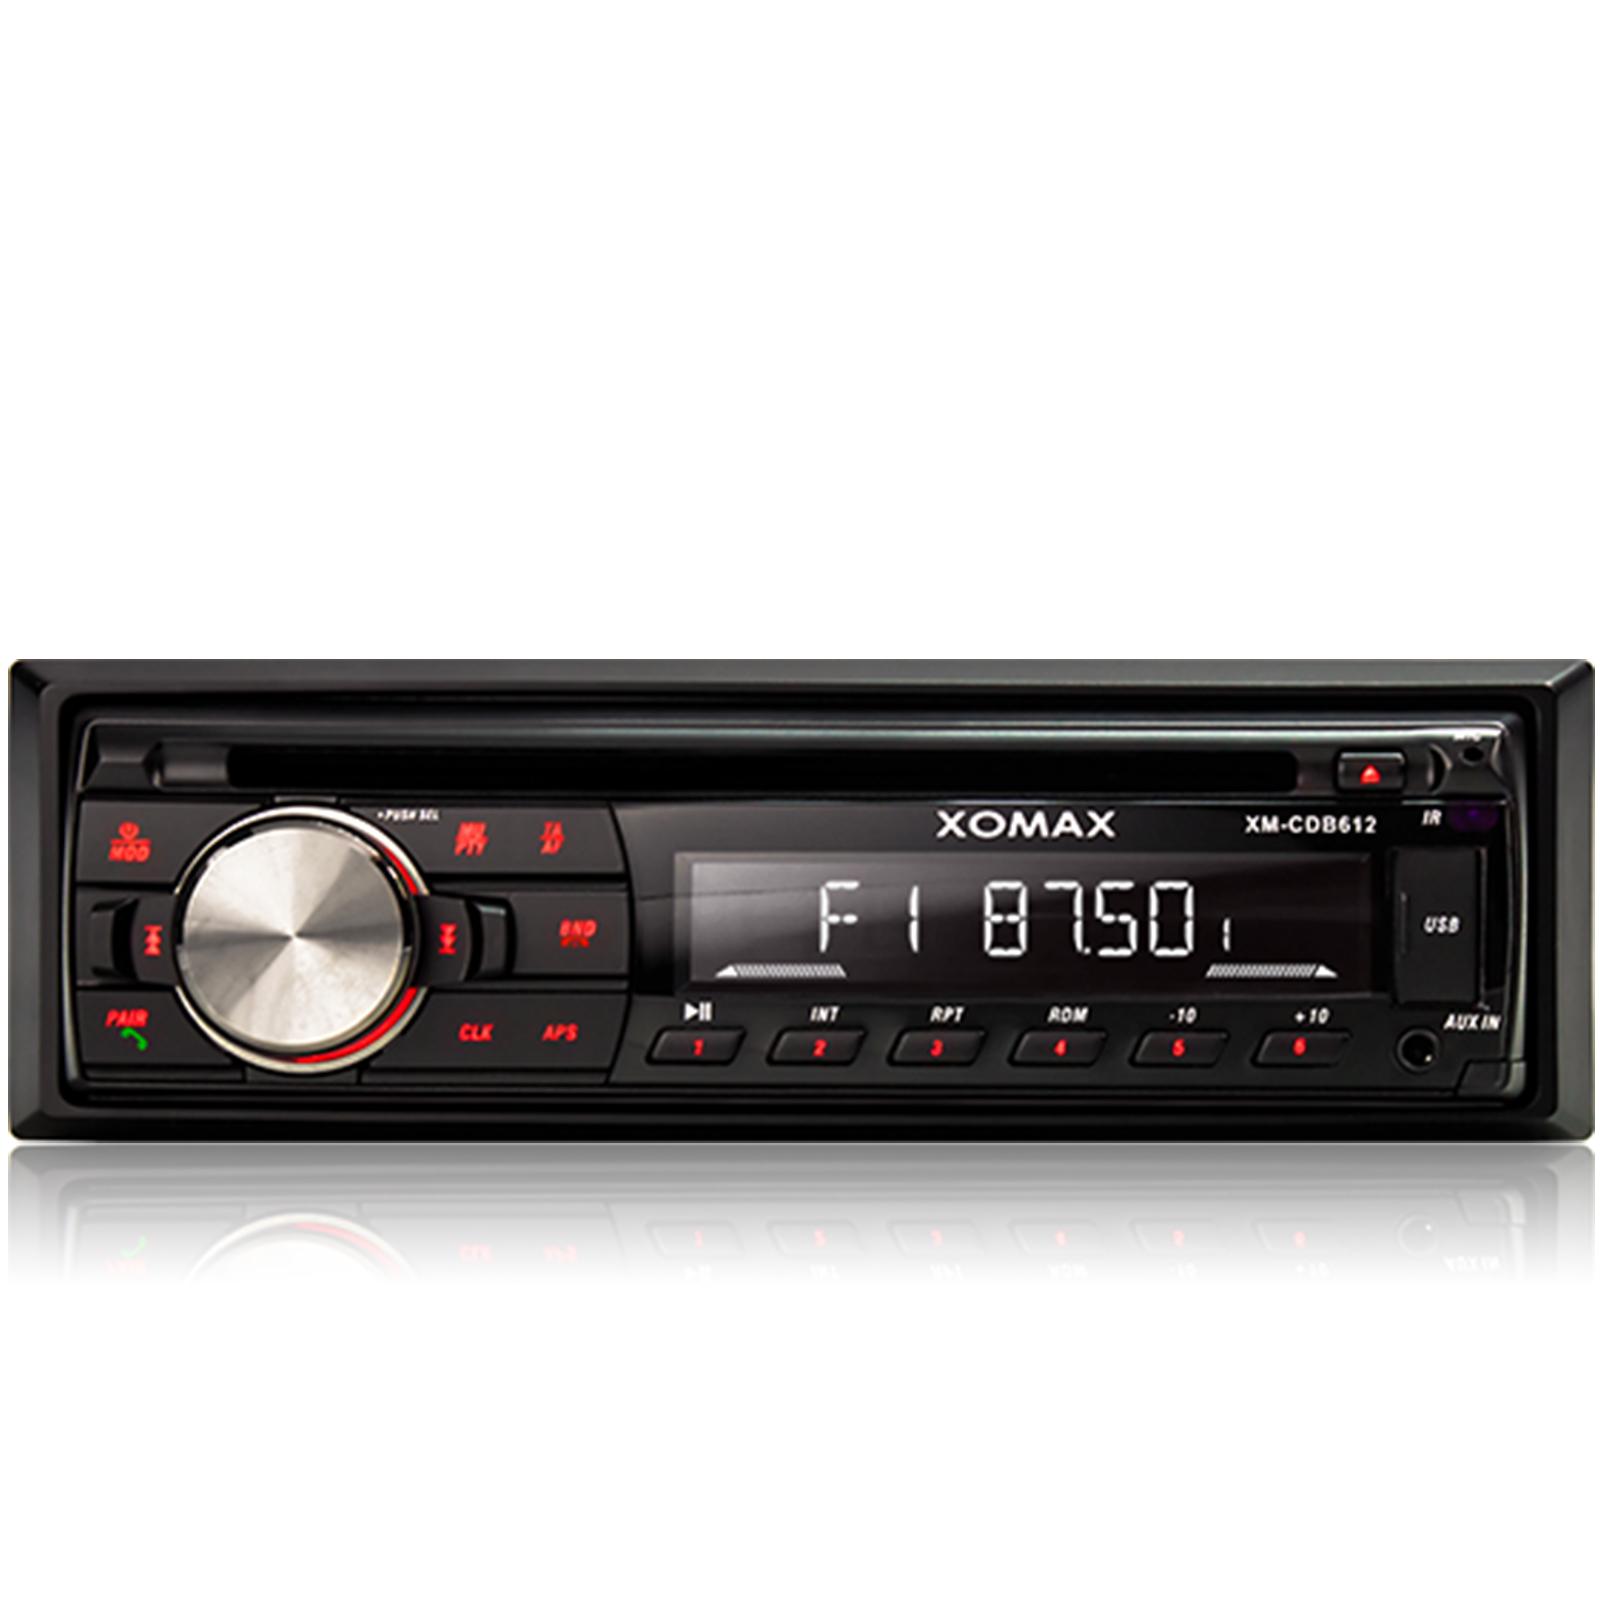 CD-AUTORADIO-mit-Bluetooth-USB-SD-SDHC-MP3-WMA-4x60Watt-Farbe-einstellbar-1DIN